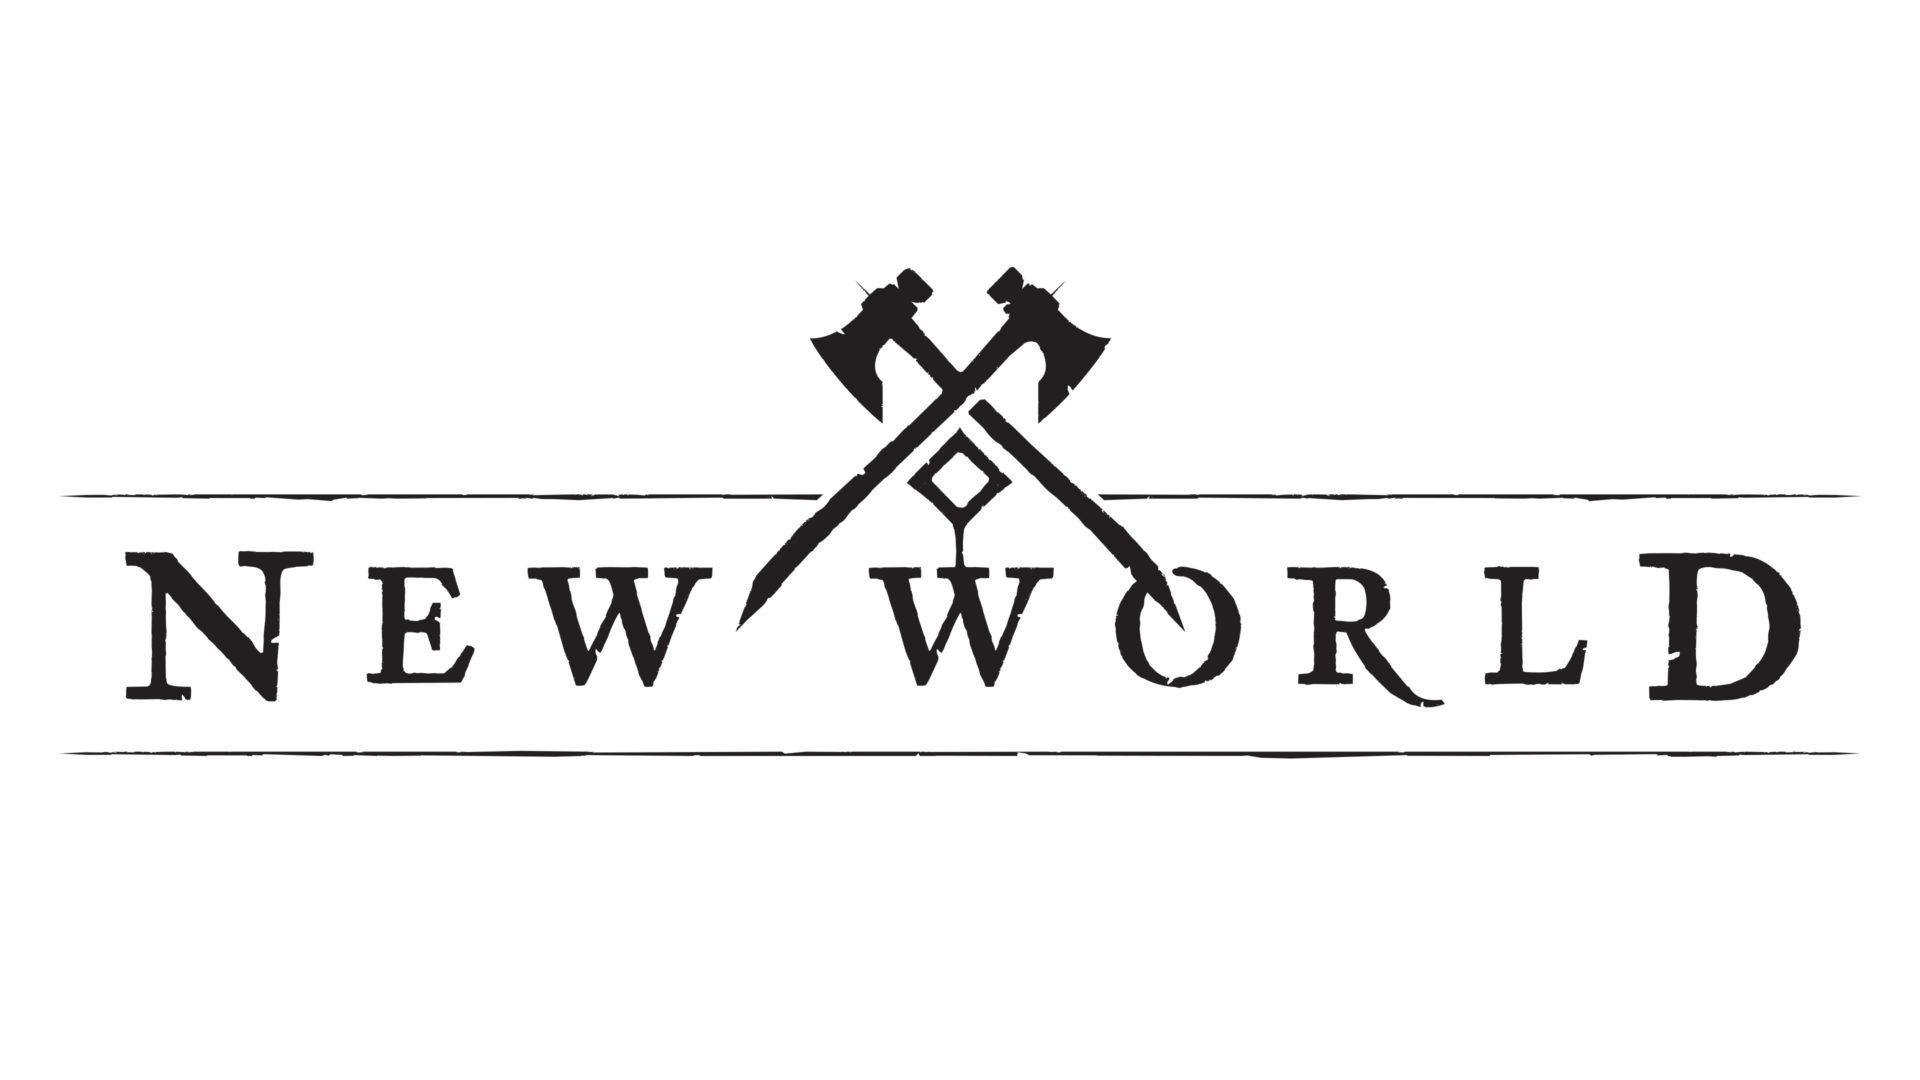 New World desktop wallpaper